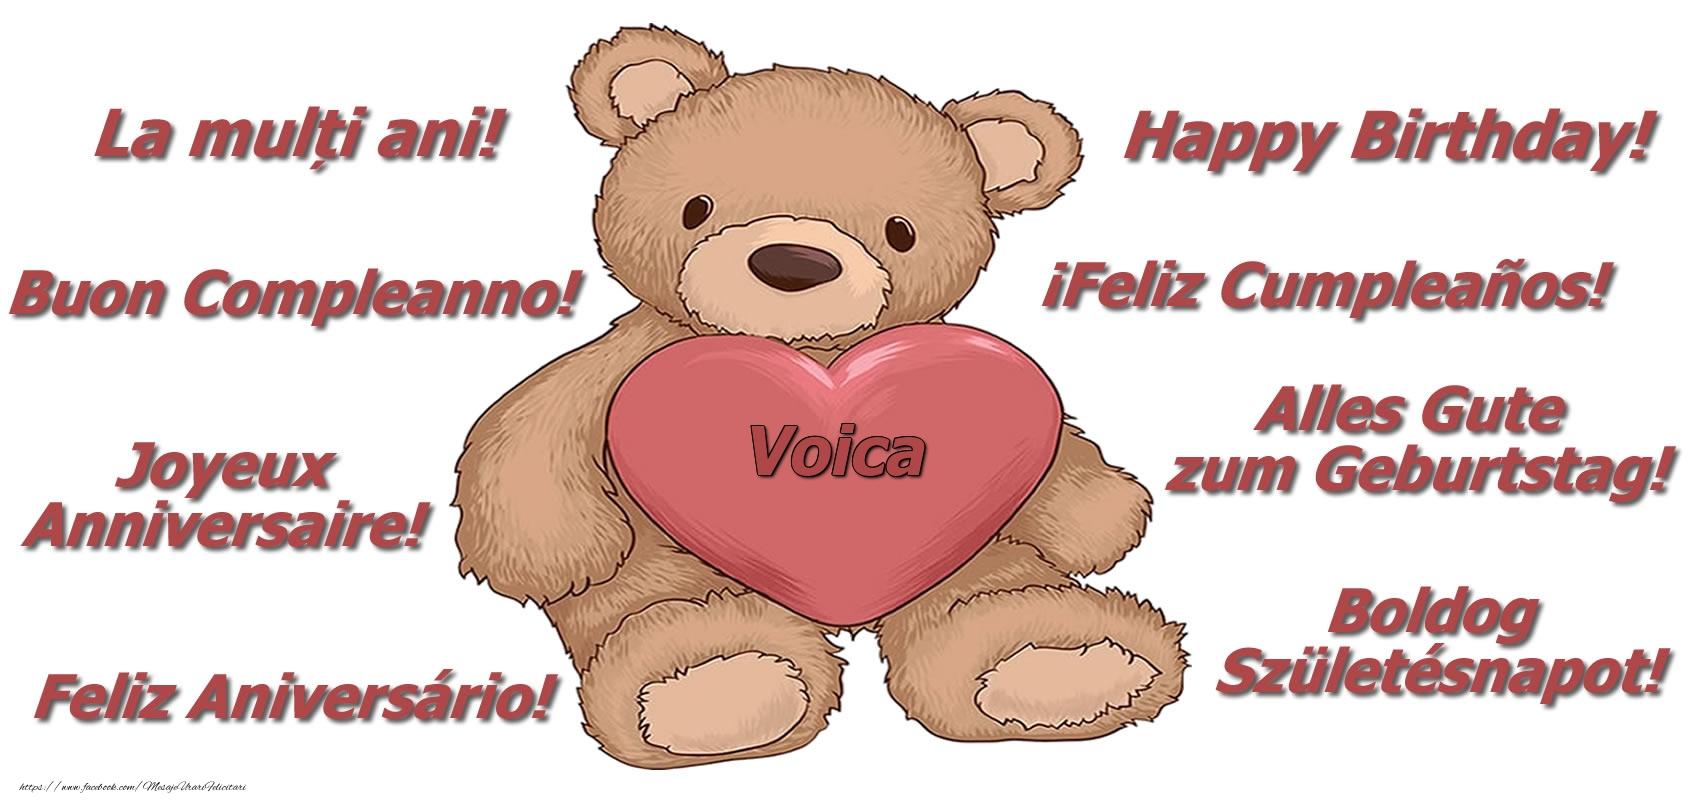 Felicitari de zi de nastere - La multi ani Voica! - Ursulet